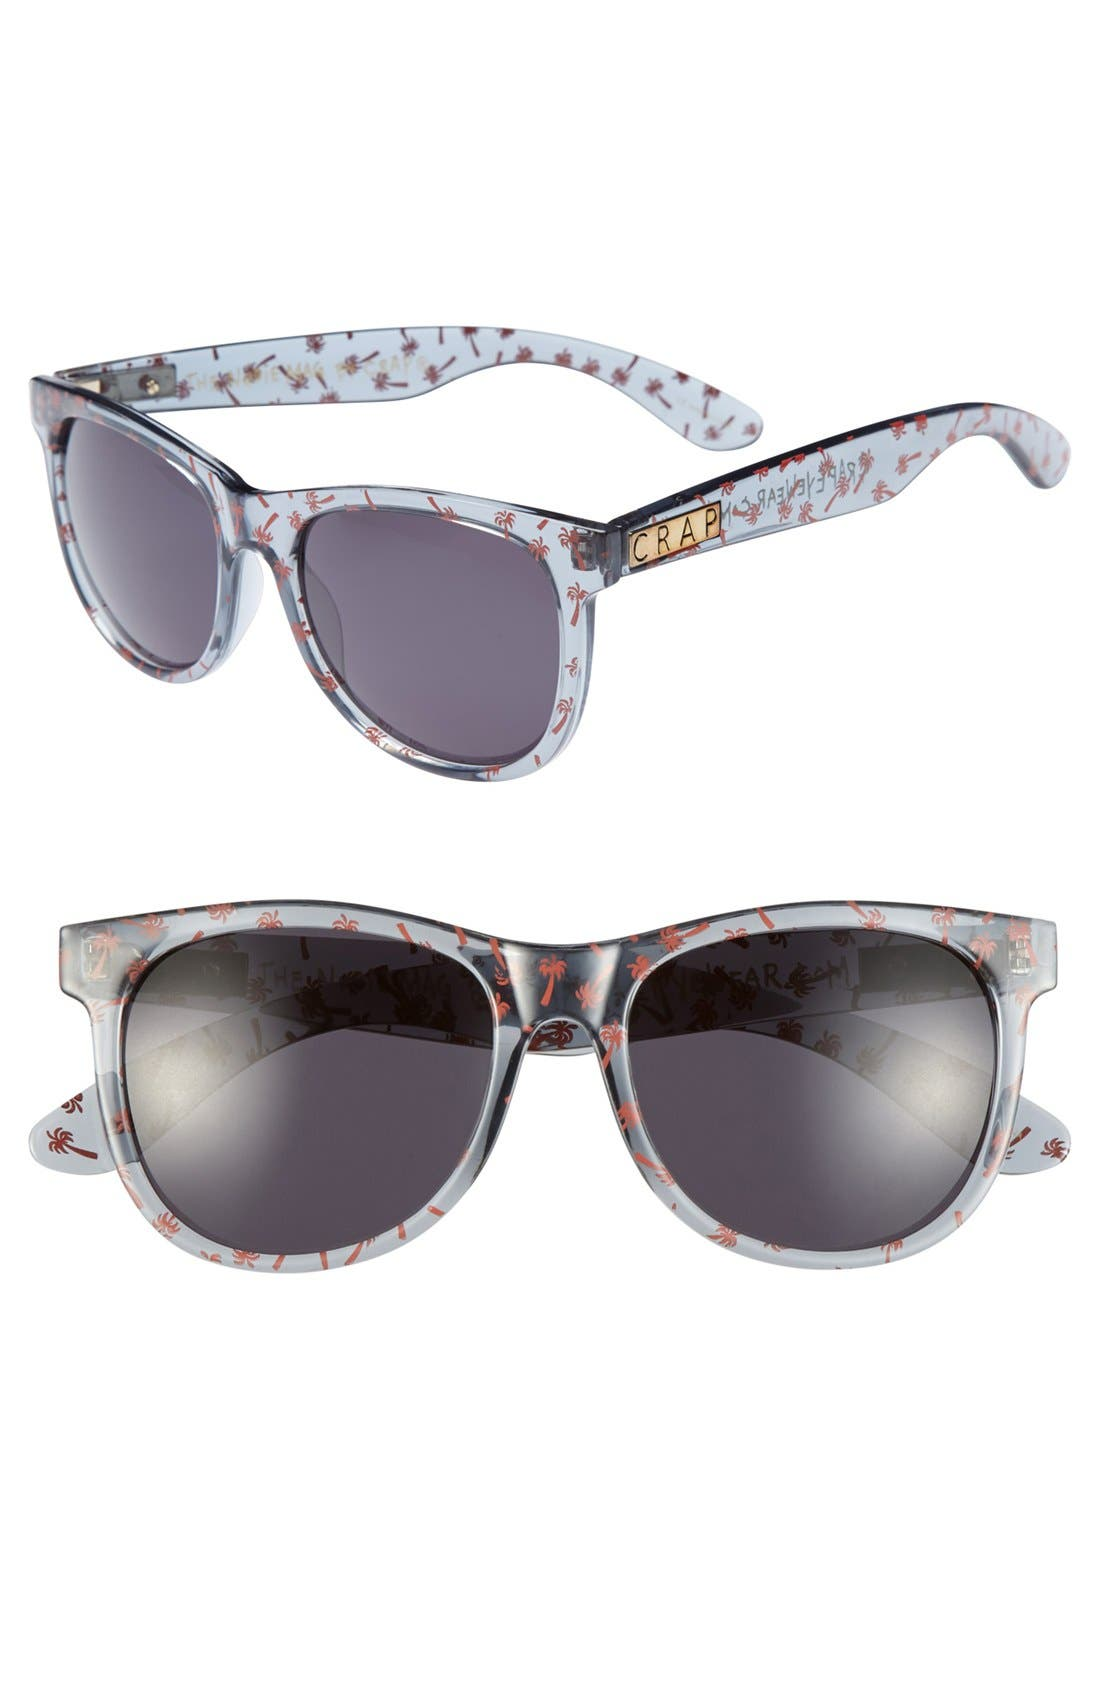 Main Image - CRAP Eyewear 'Nudie Mag' 54mm Sunglasses